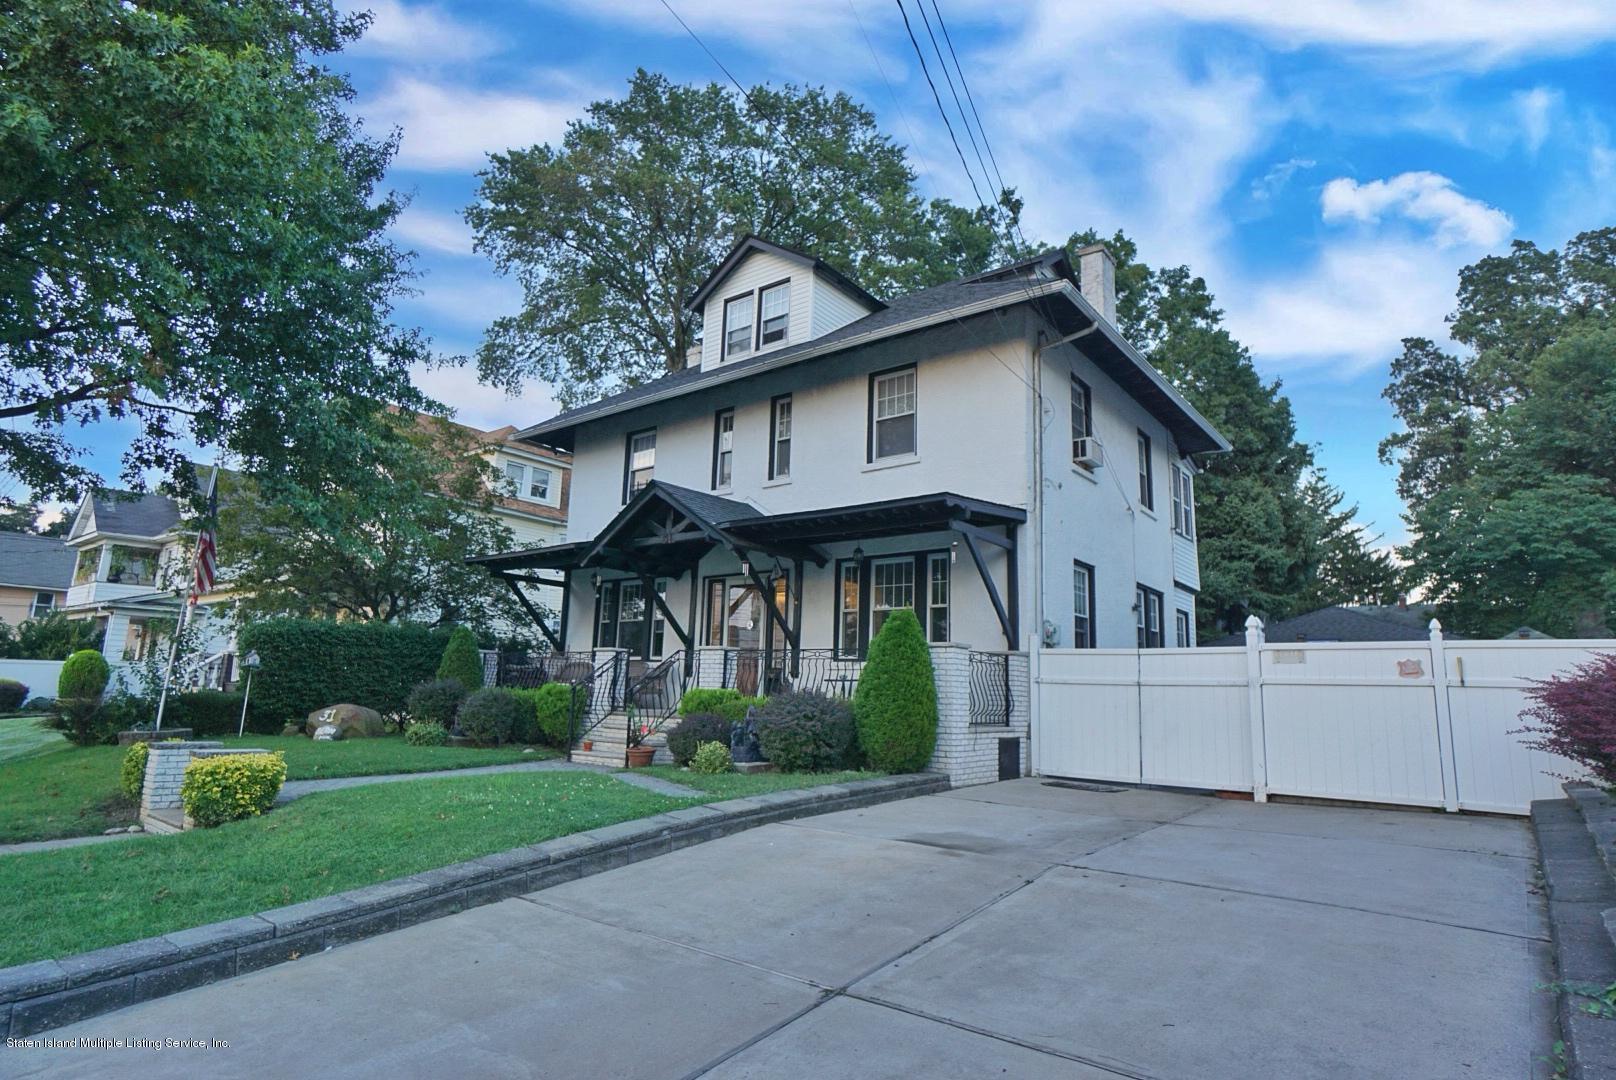 Single Family - Detached 31 Pelton Avenue  Staten Island, NY 10310, MLS-1132177-3